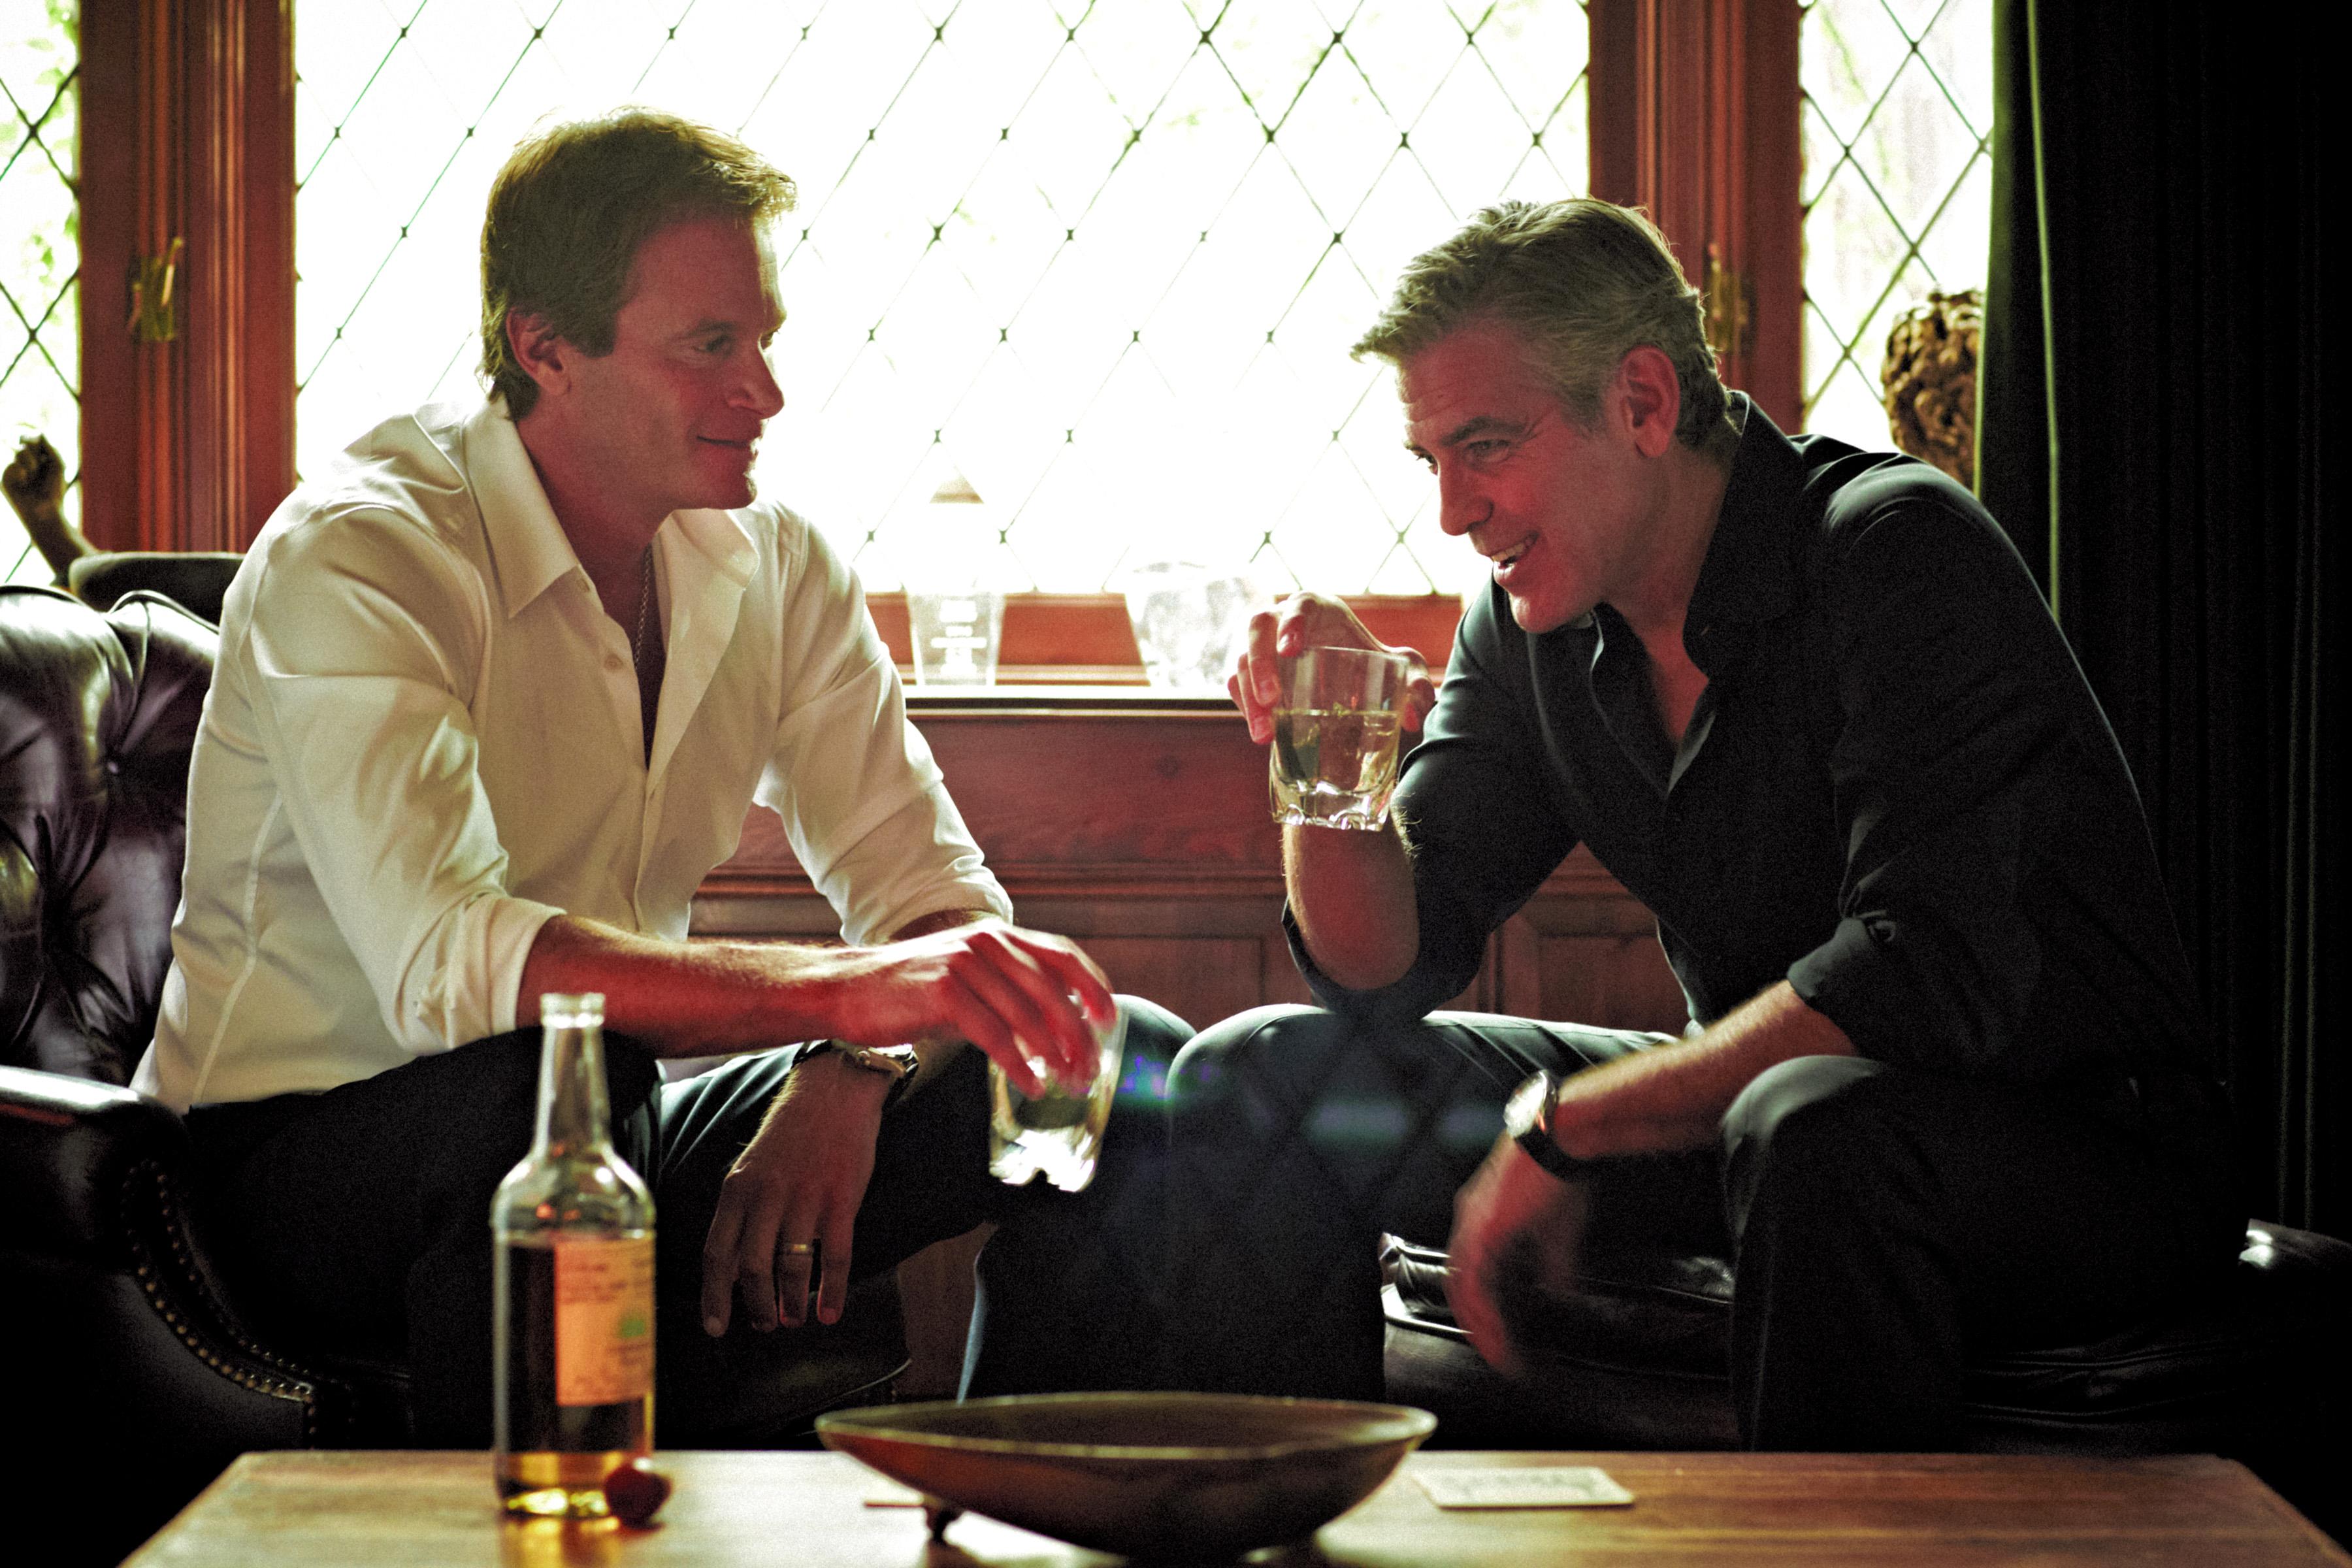 Casamigos Tequila Founders Rande Gerber & George Clooney